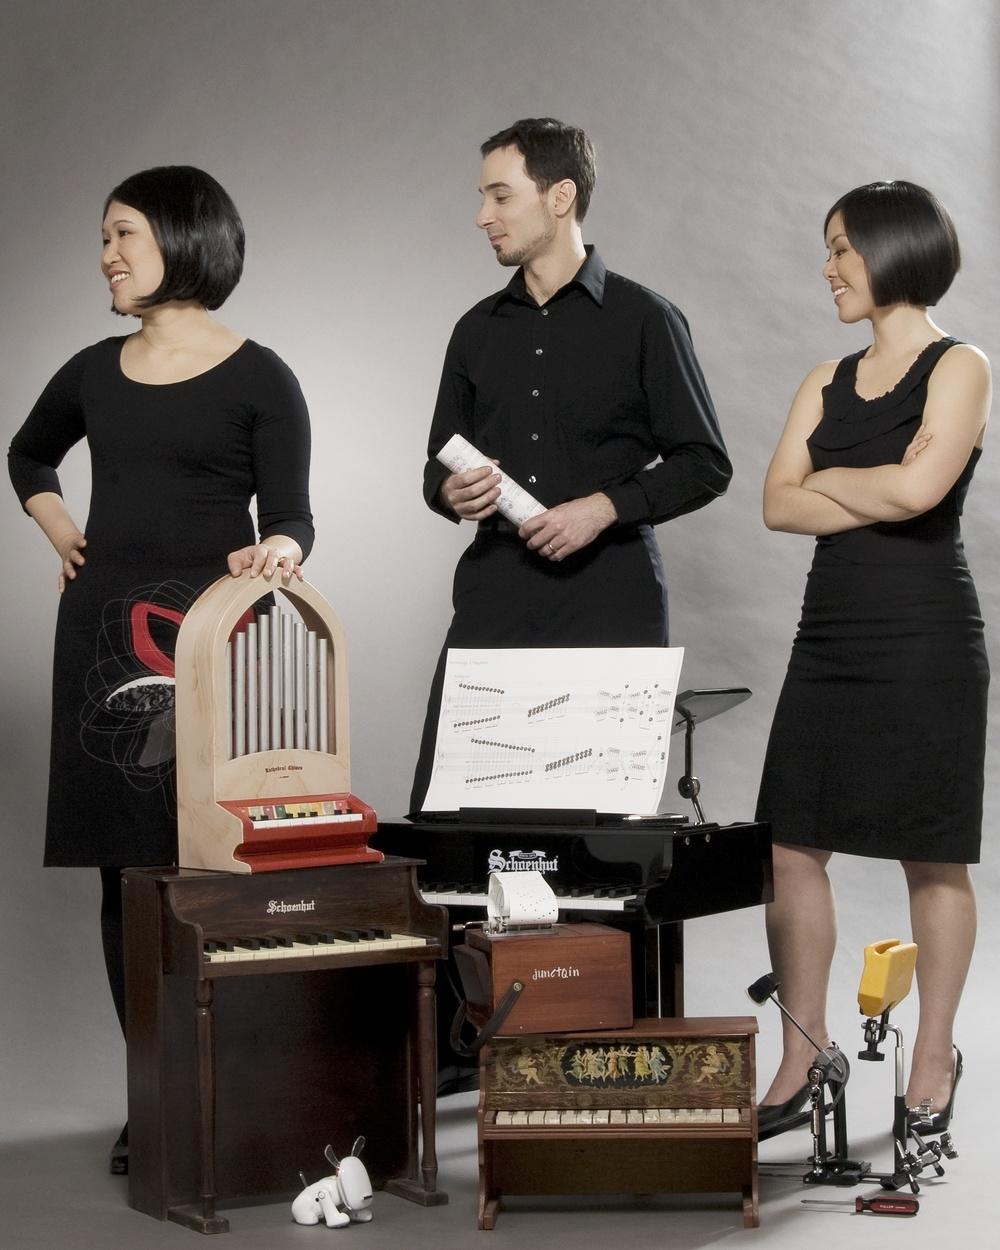 junctQín Keyboard Collective: Elaine Lau, Joseph Ferretti, Stephanie Chua